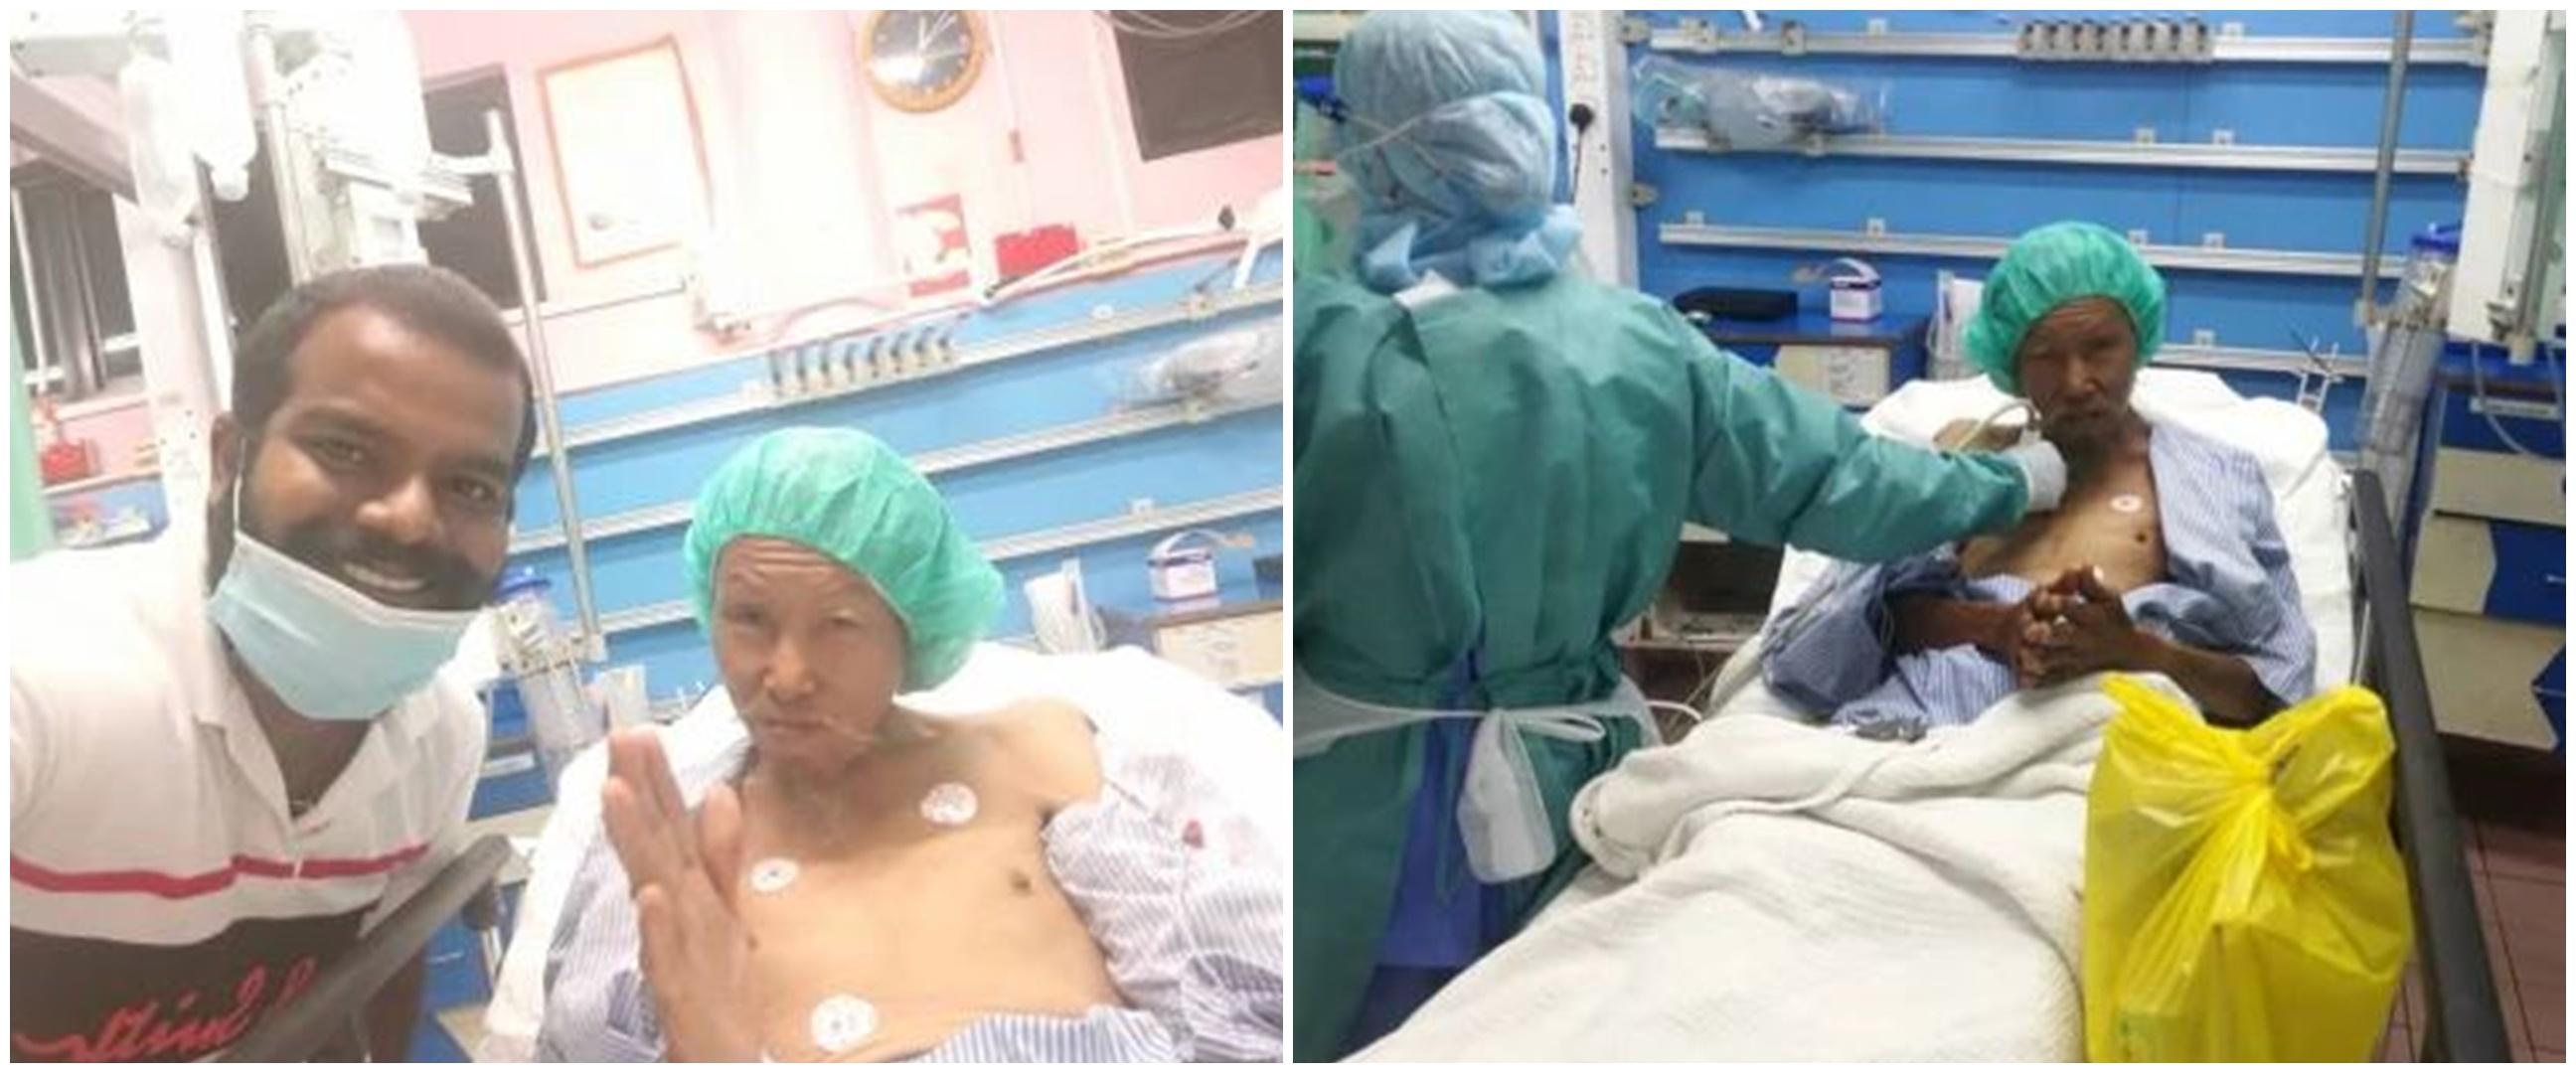 Kisah driver ojek online tolong kakek yang terluka ini bikin salut